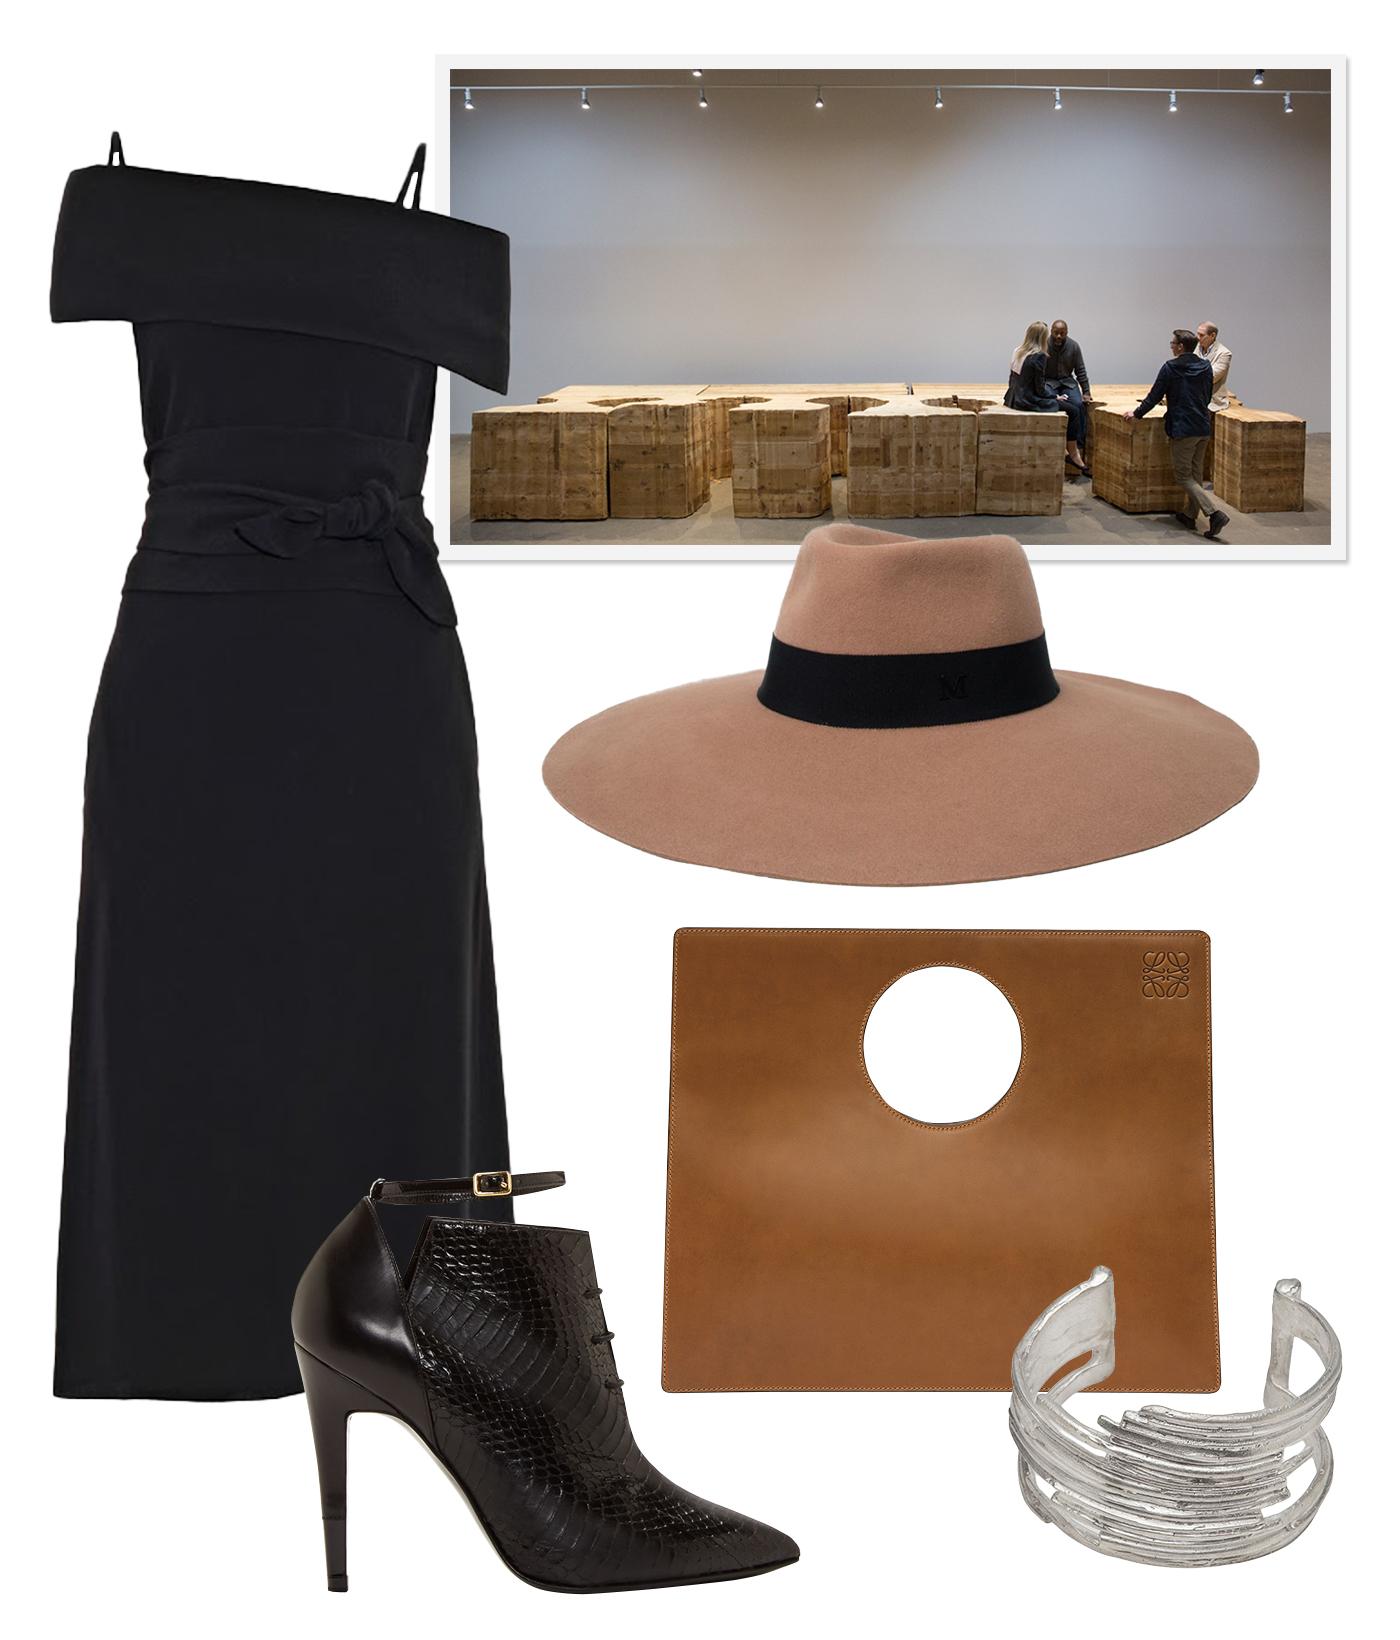 art-basel-outfit-ideas_08.jpg